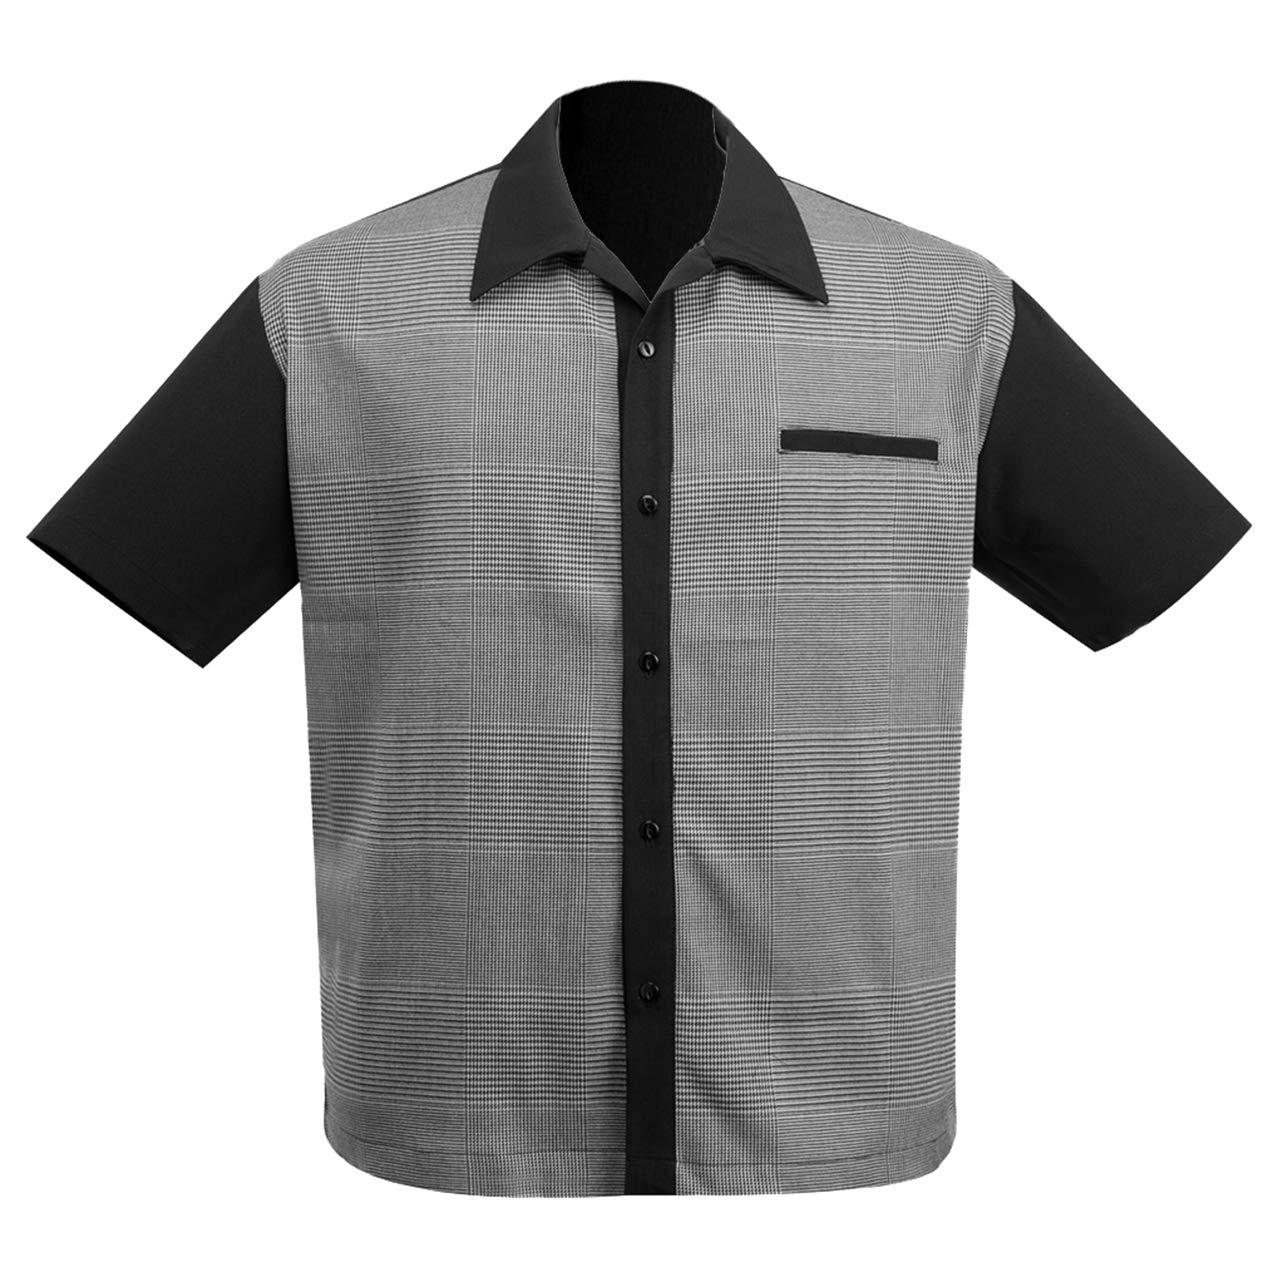 Vintage Mens Clothing | Retro Clothing for Men Steady Clothing Mens Bad News Felix Bowling Shirt Black $69.99 AT vintagedancer.com